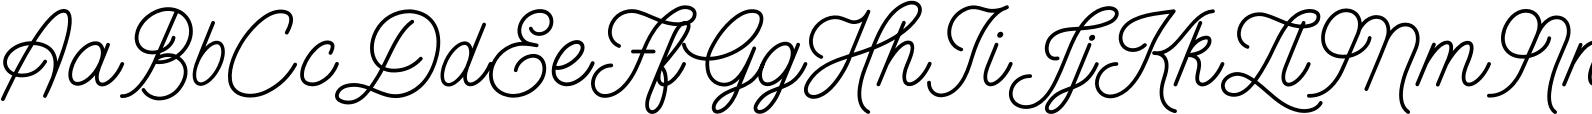 The Giant Bundle (50 Fonts)